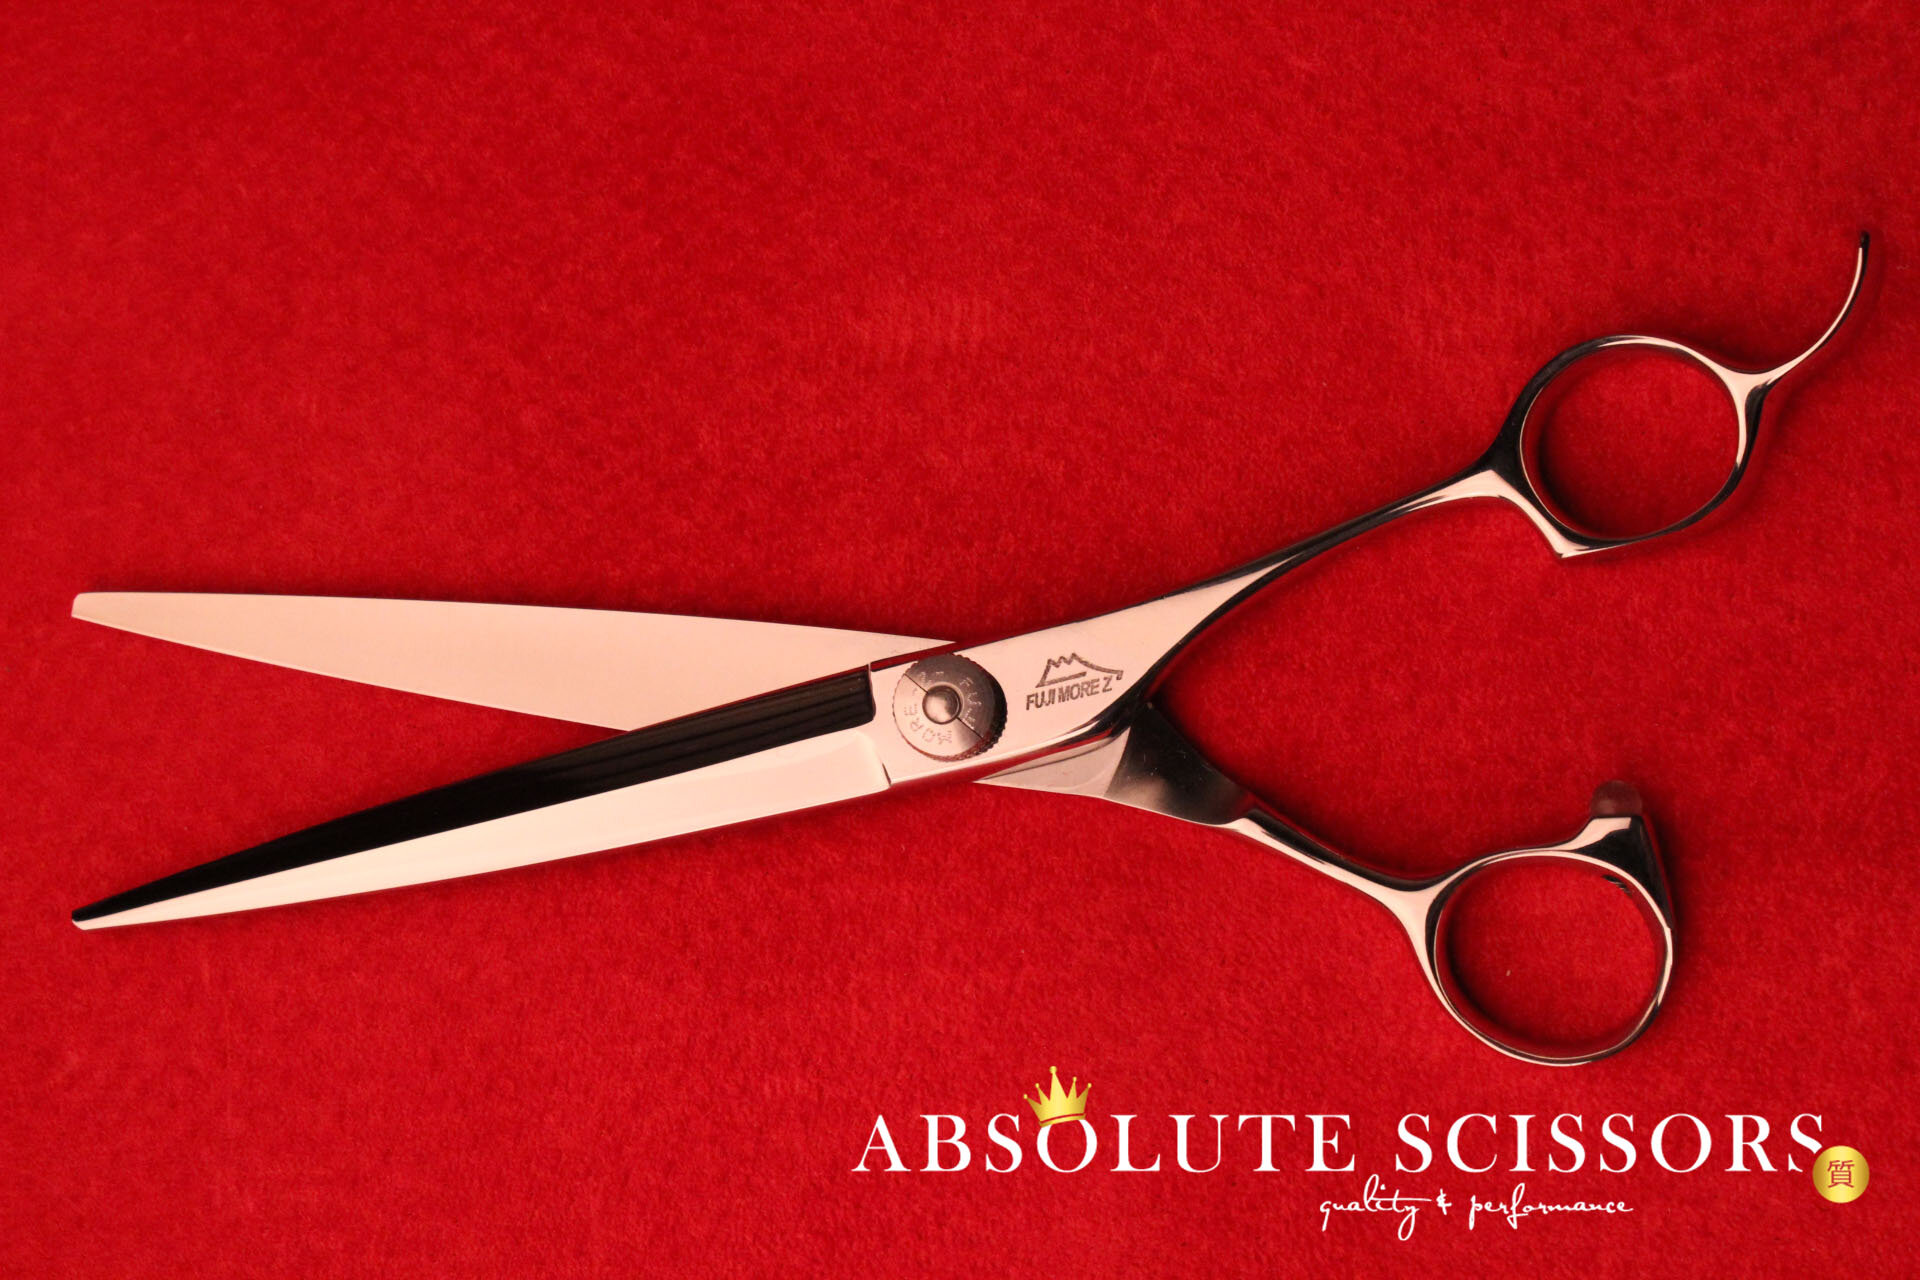 DXGF70 3824 Fuji hair scissors size 7 inches